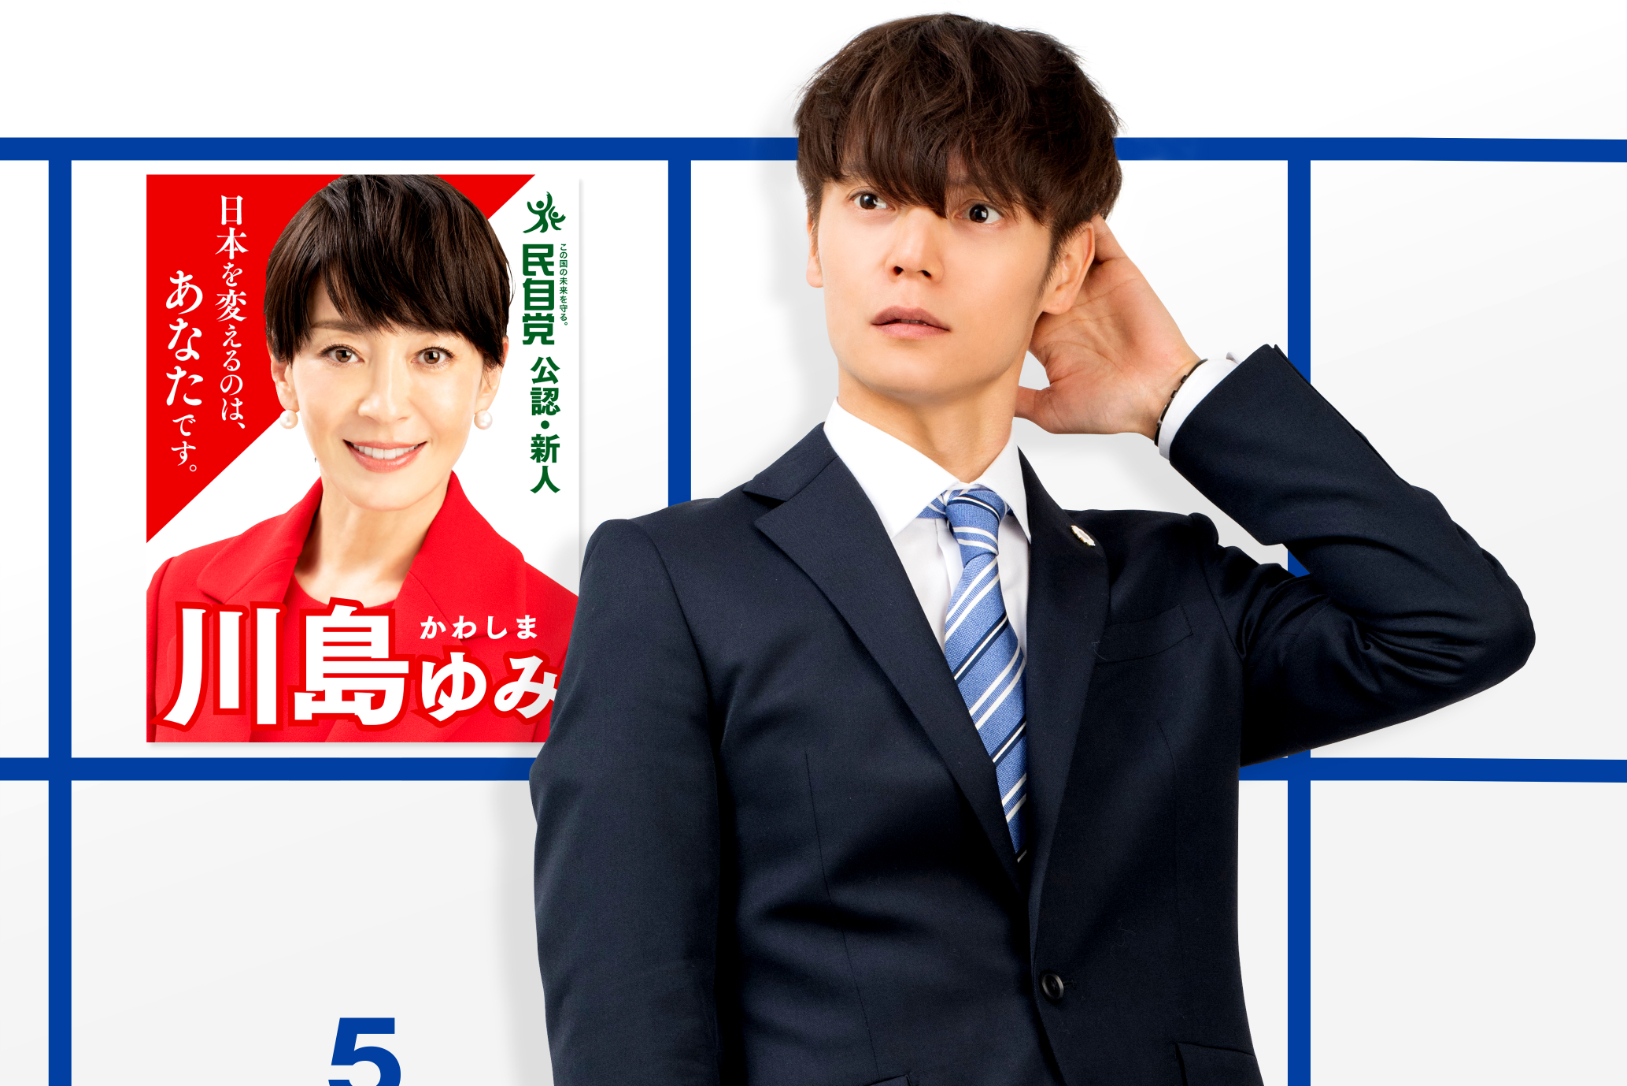 映画『決戦は日曜日』 (C)2021「決戦は日曜日」製作委員会